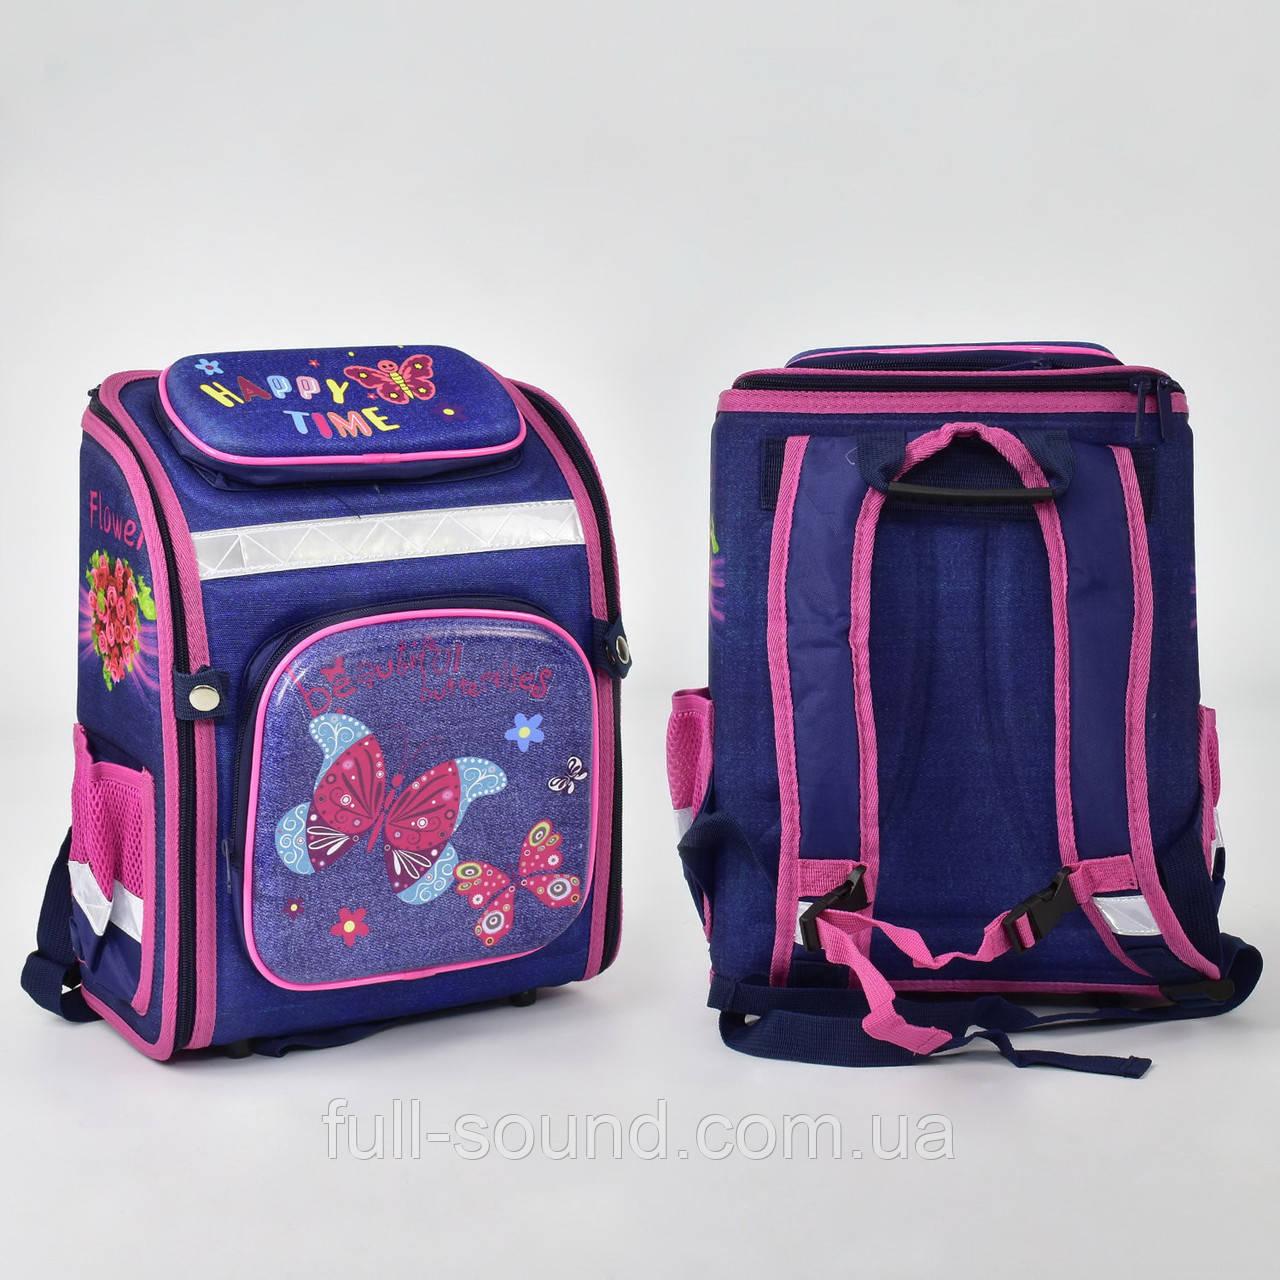 Школьный каркасный рюкзак N 0018